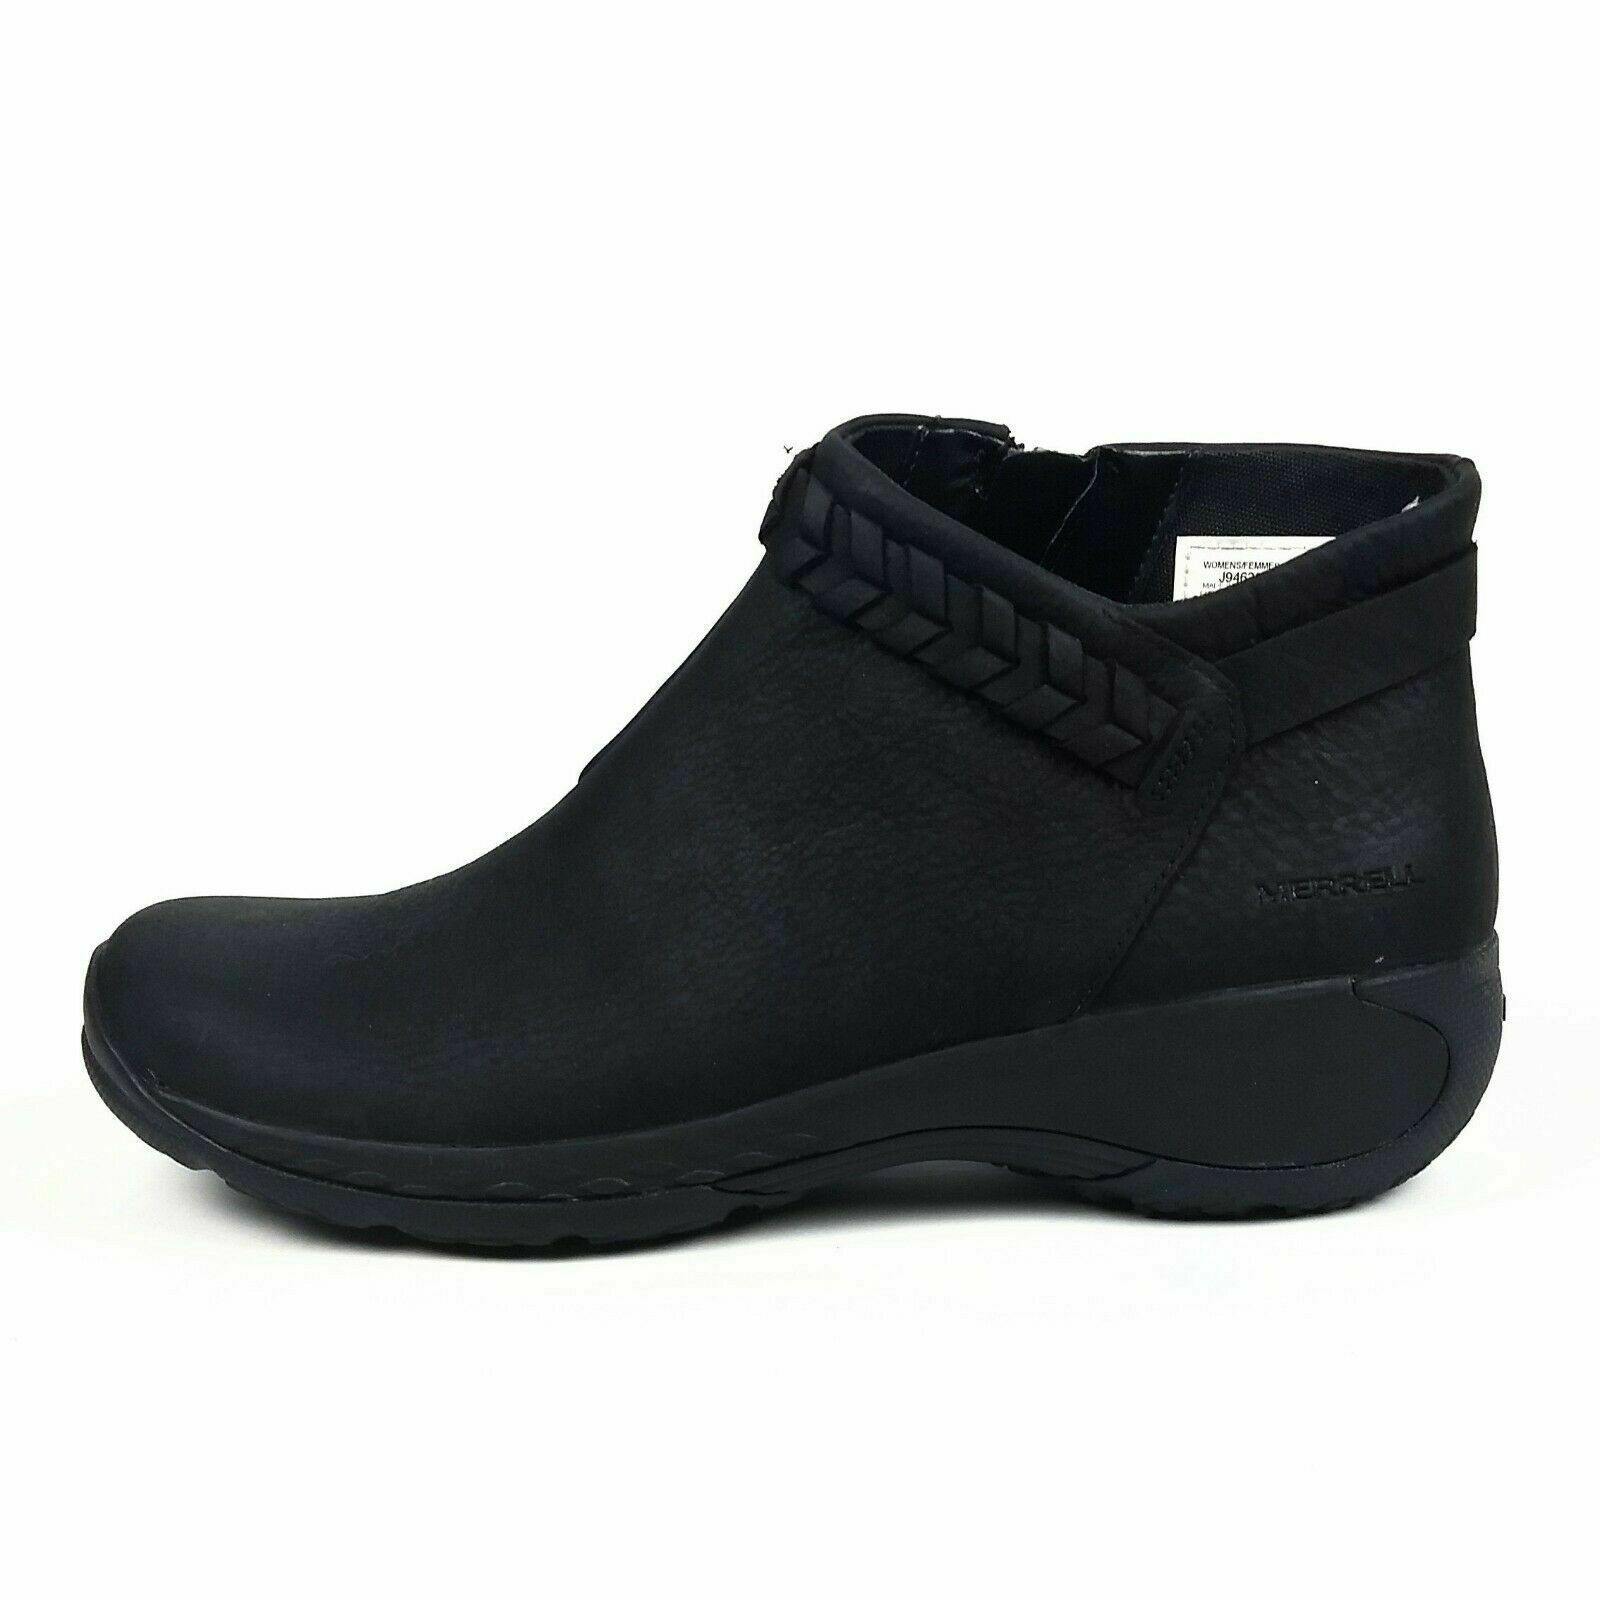 Merrell Women's Encore Braided Bluff Q2 Fashion Boots NEW Size US 7.5 M - $109.99